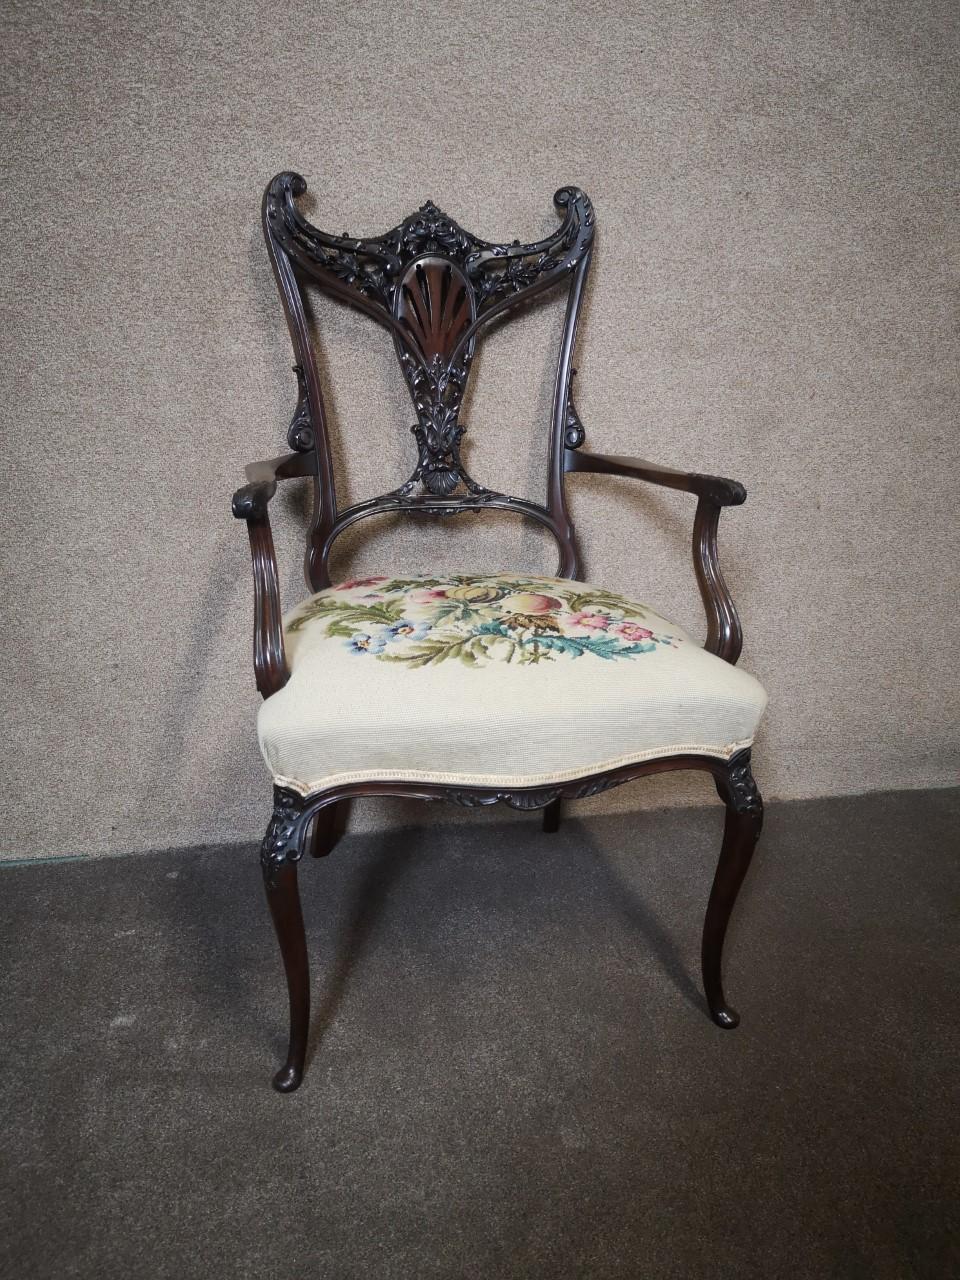 Edwardian chair画像